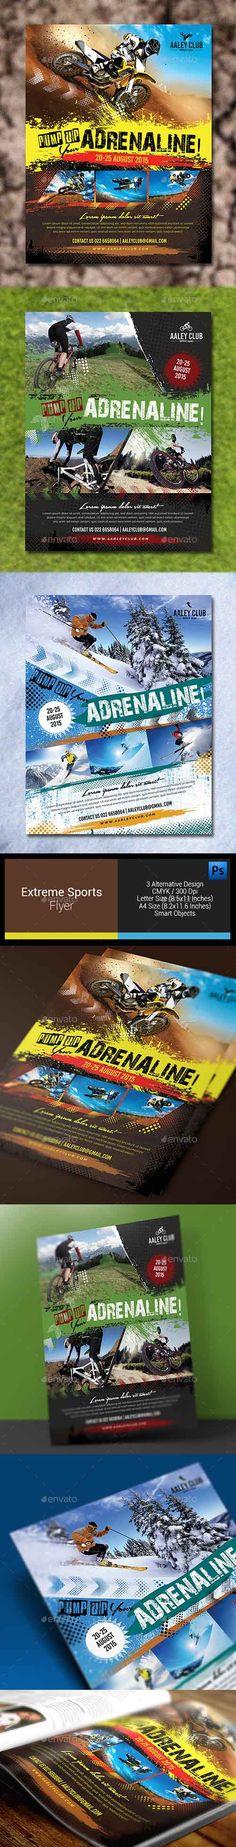 Extreme Sports Flyer / Magazine Ad 12817110